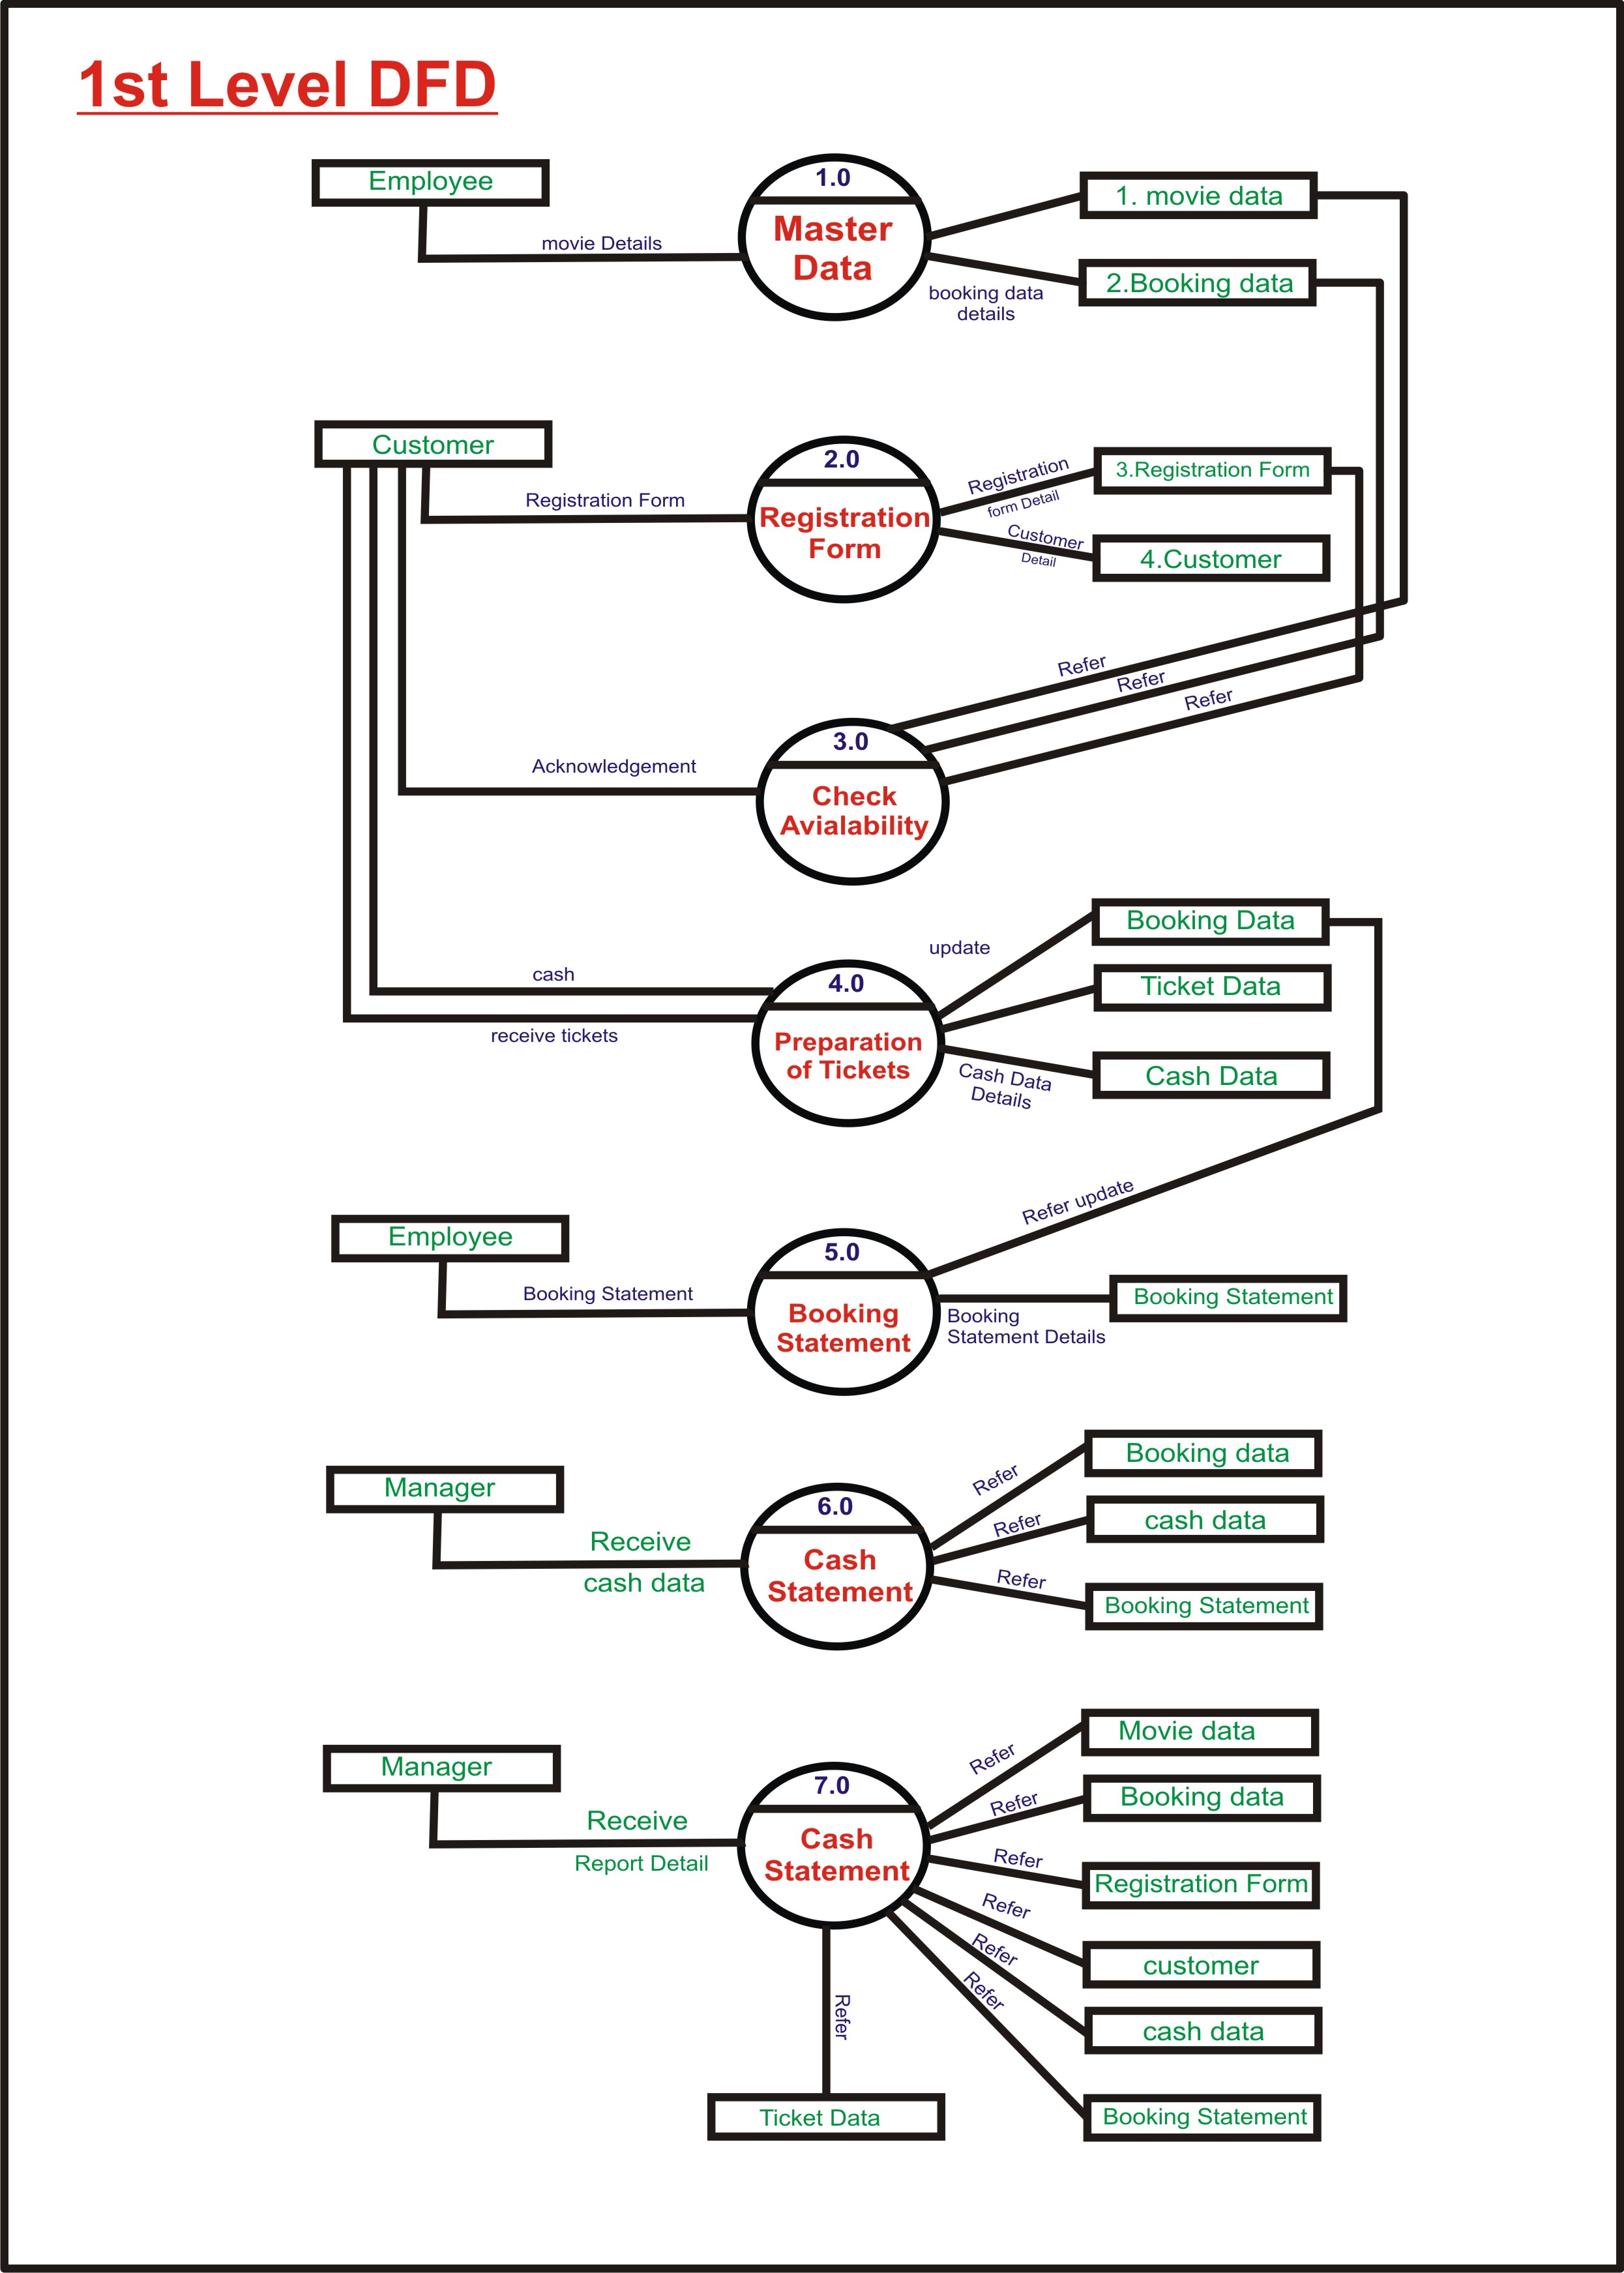 er diagram movie list wiring for 3 way light switch three deshmukhaslam go and get success